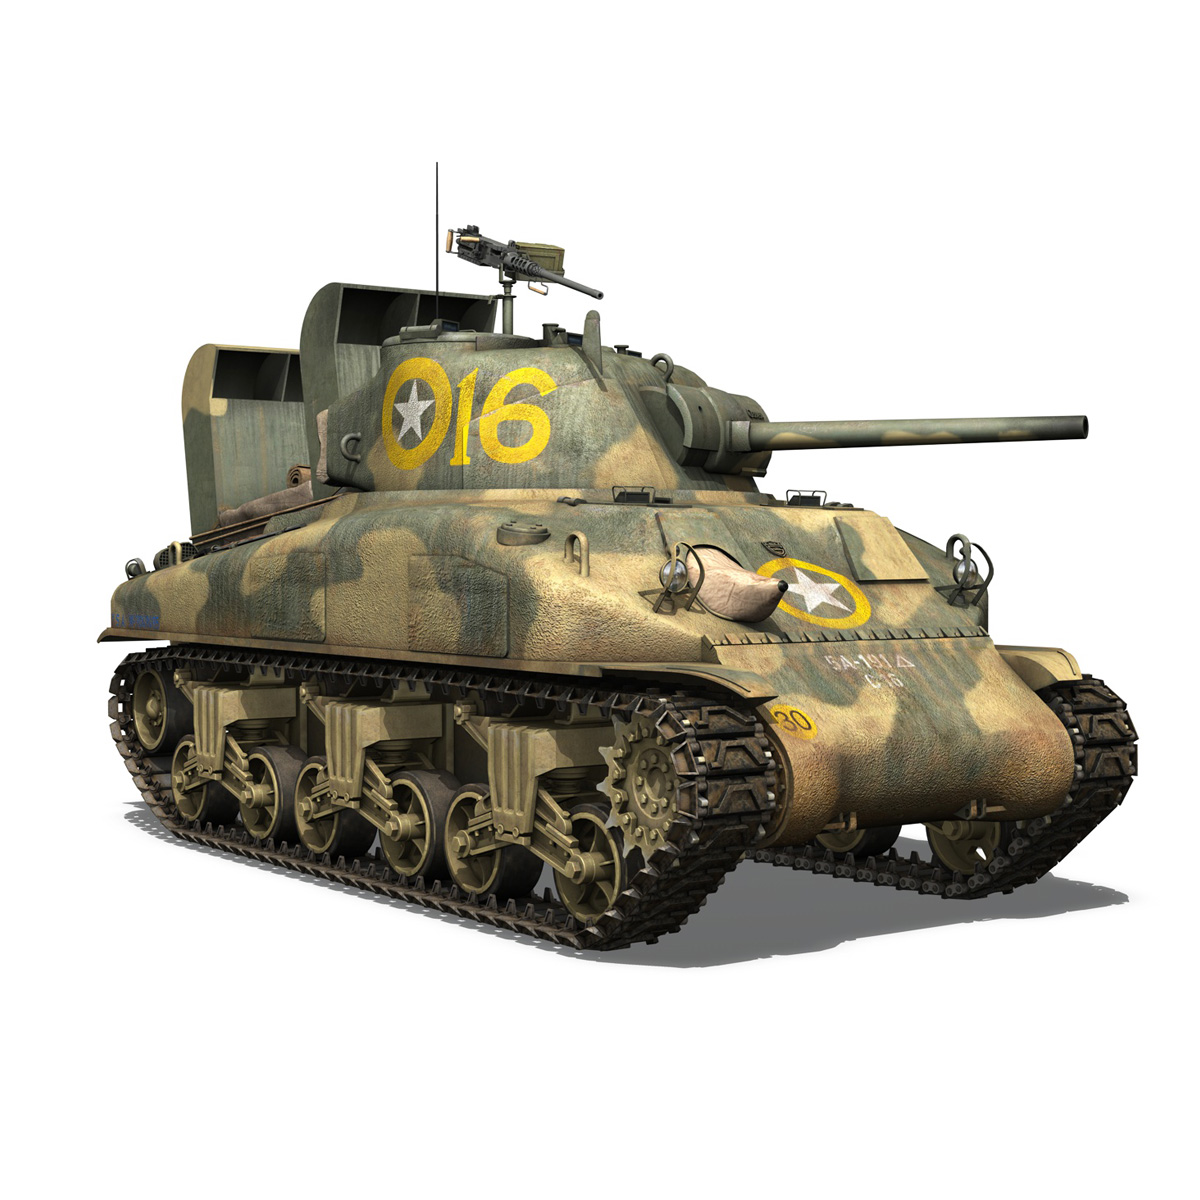 M4A1 Sherman - 16 3d model 3ds fbx c4d lwo lws lw obj 273057